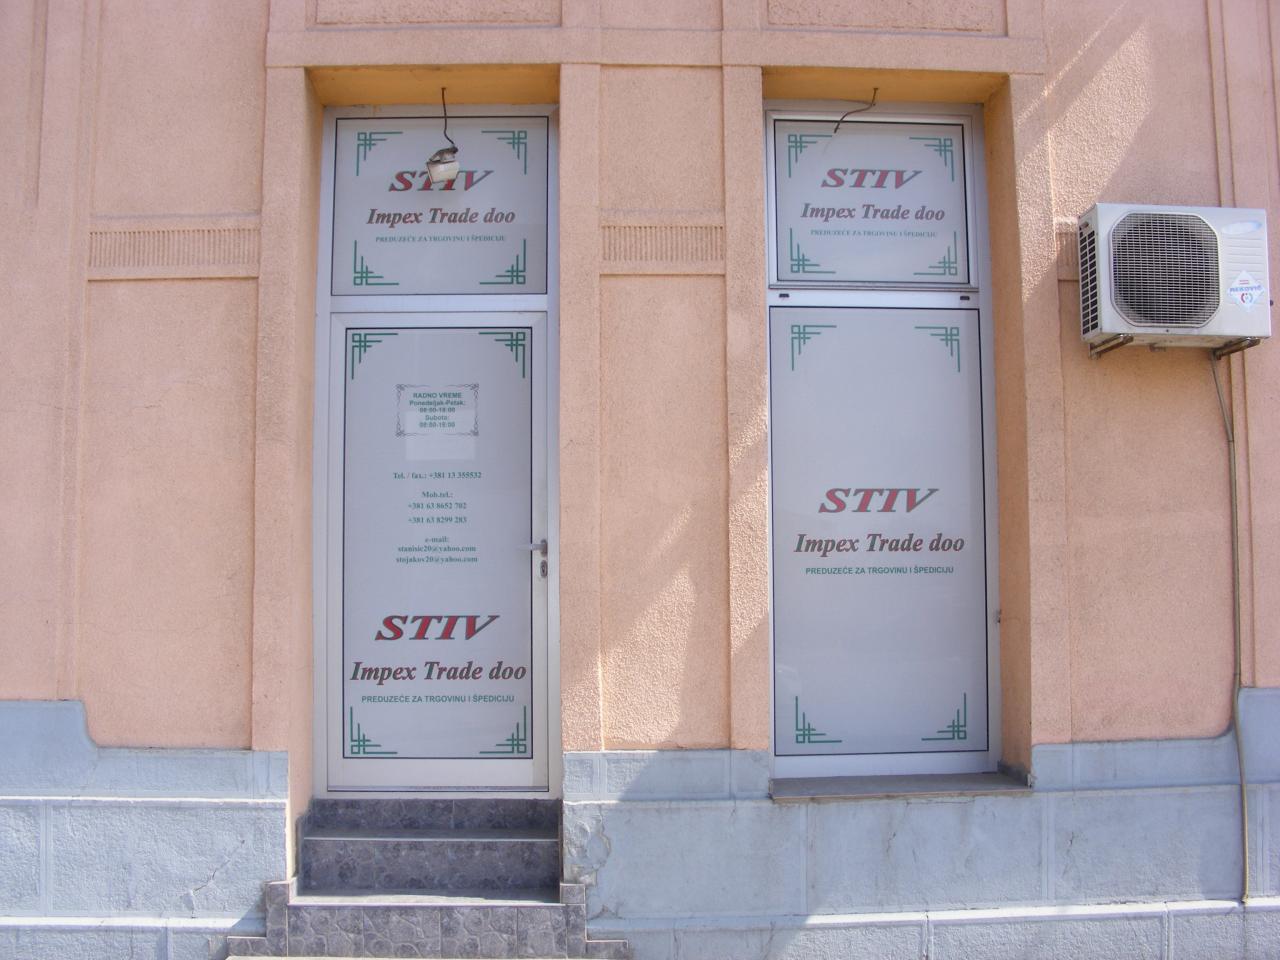 STIV IMPEX TRADE DOO Špedicija, drumski transport Pančevo